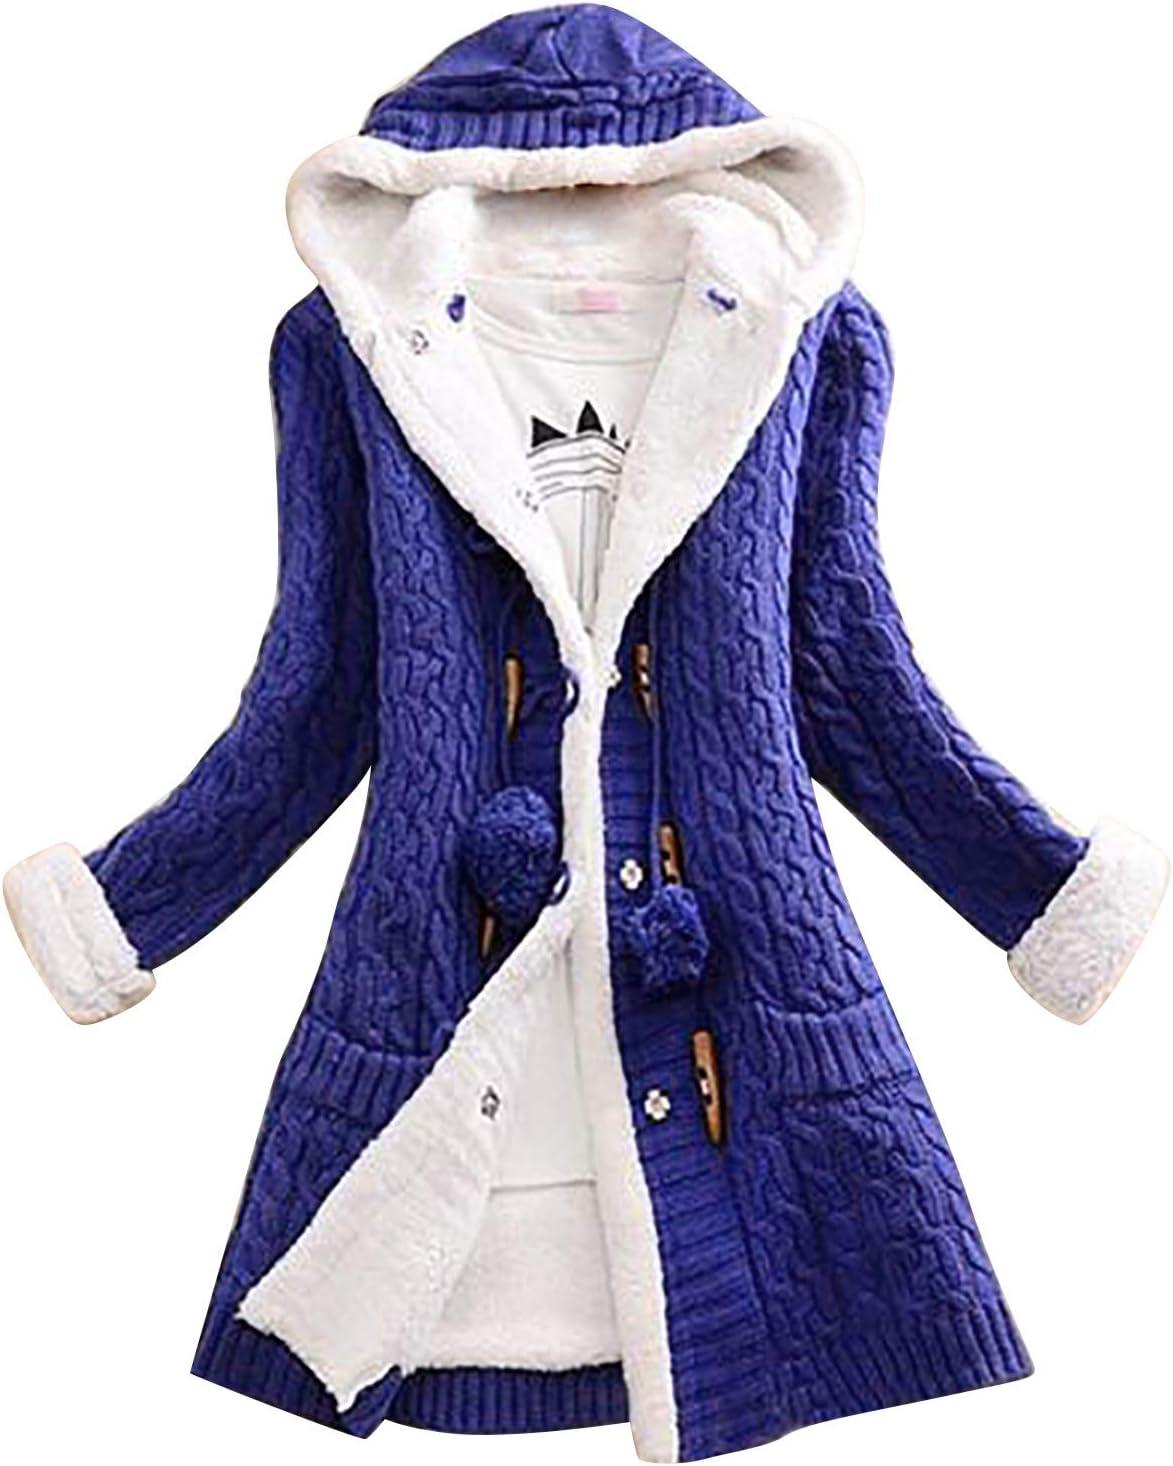 Gwewei4df Womens Fresno Mall Plus Size Hoodie Kni Cardigan Casual Coat Denver Mall Women